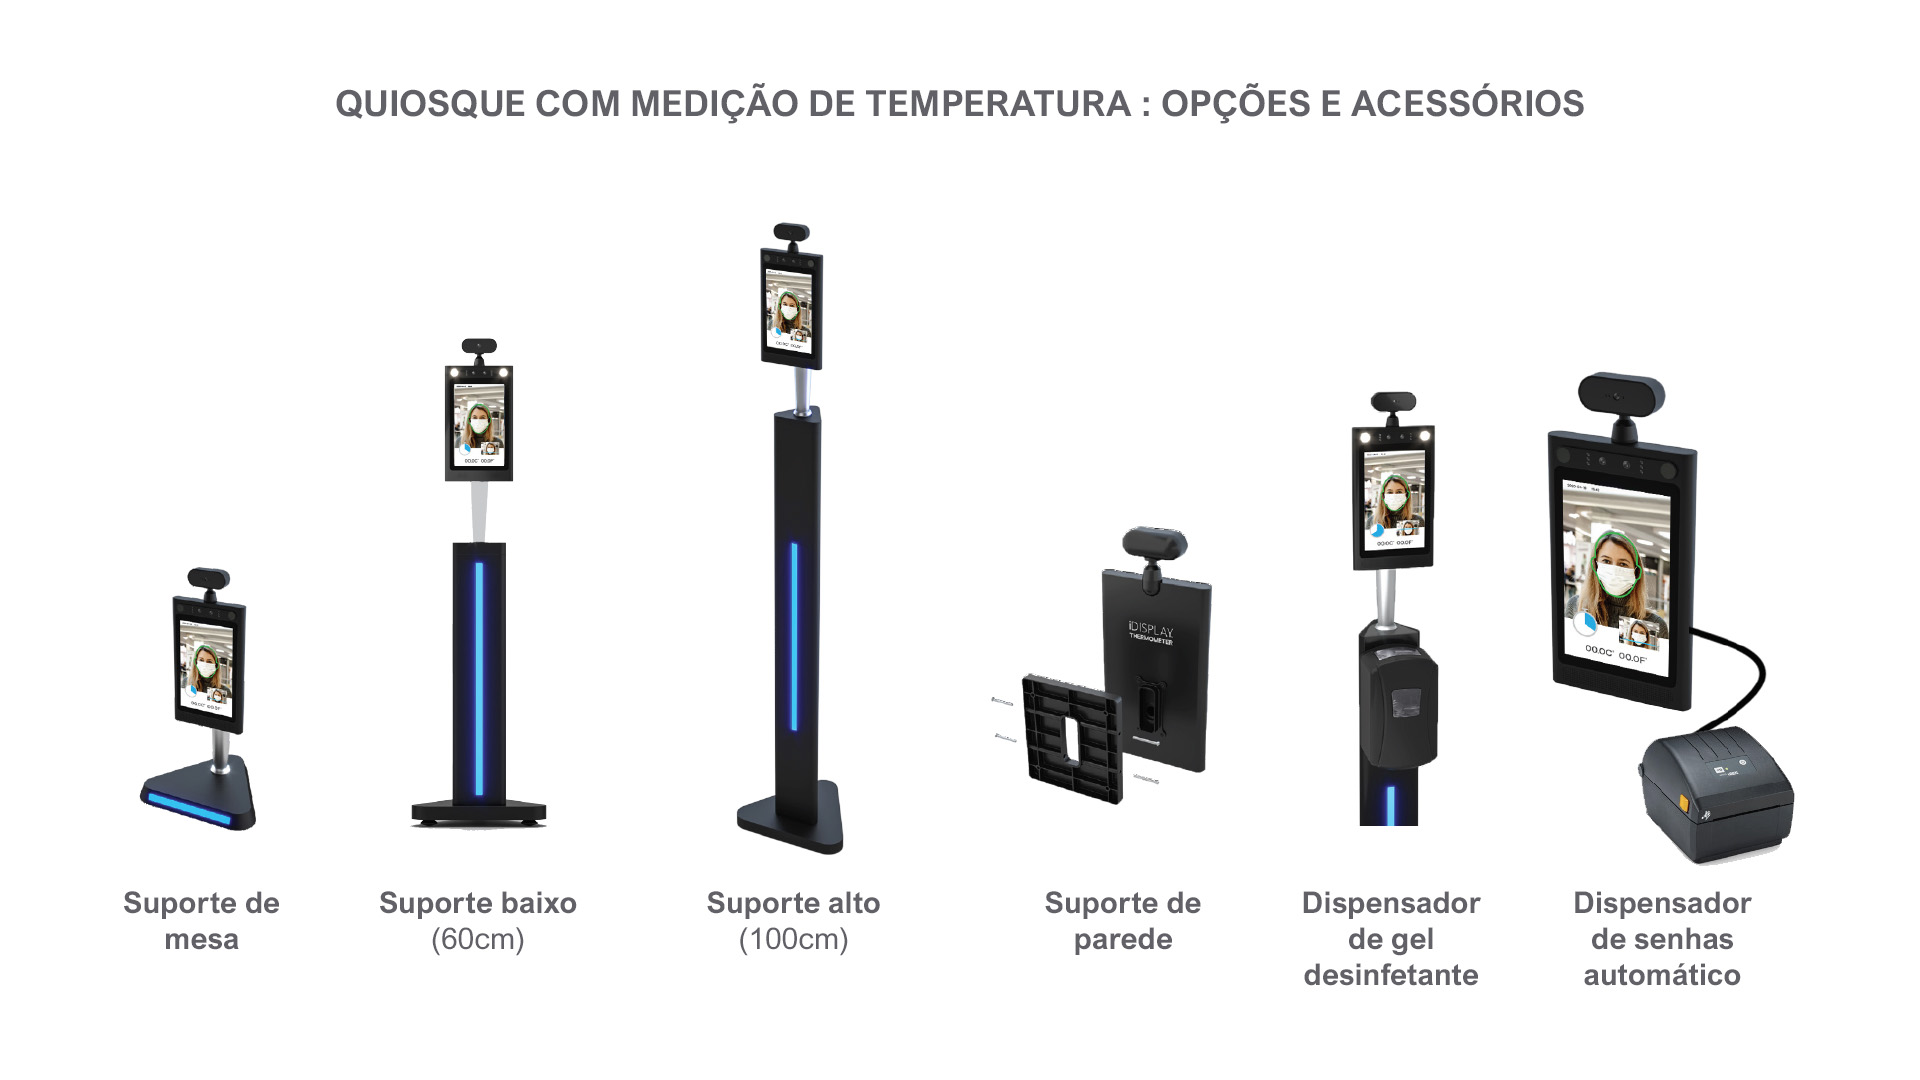 kiosk_temperatura_1